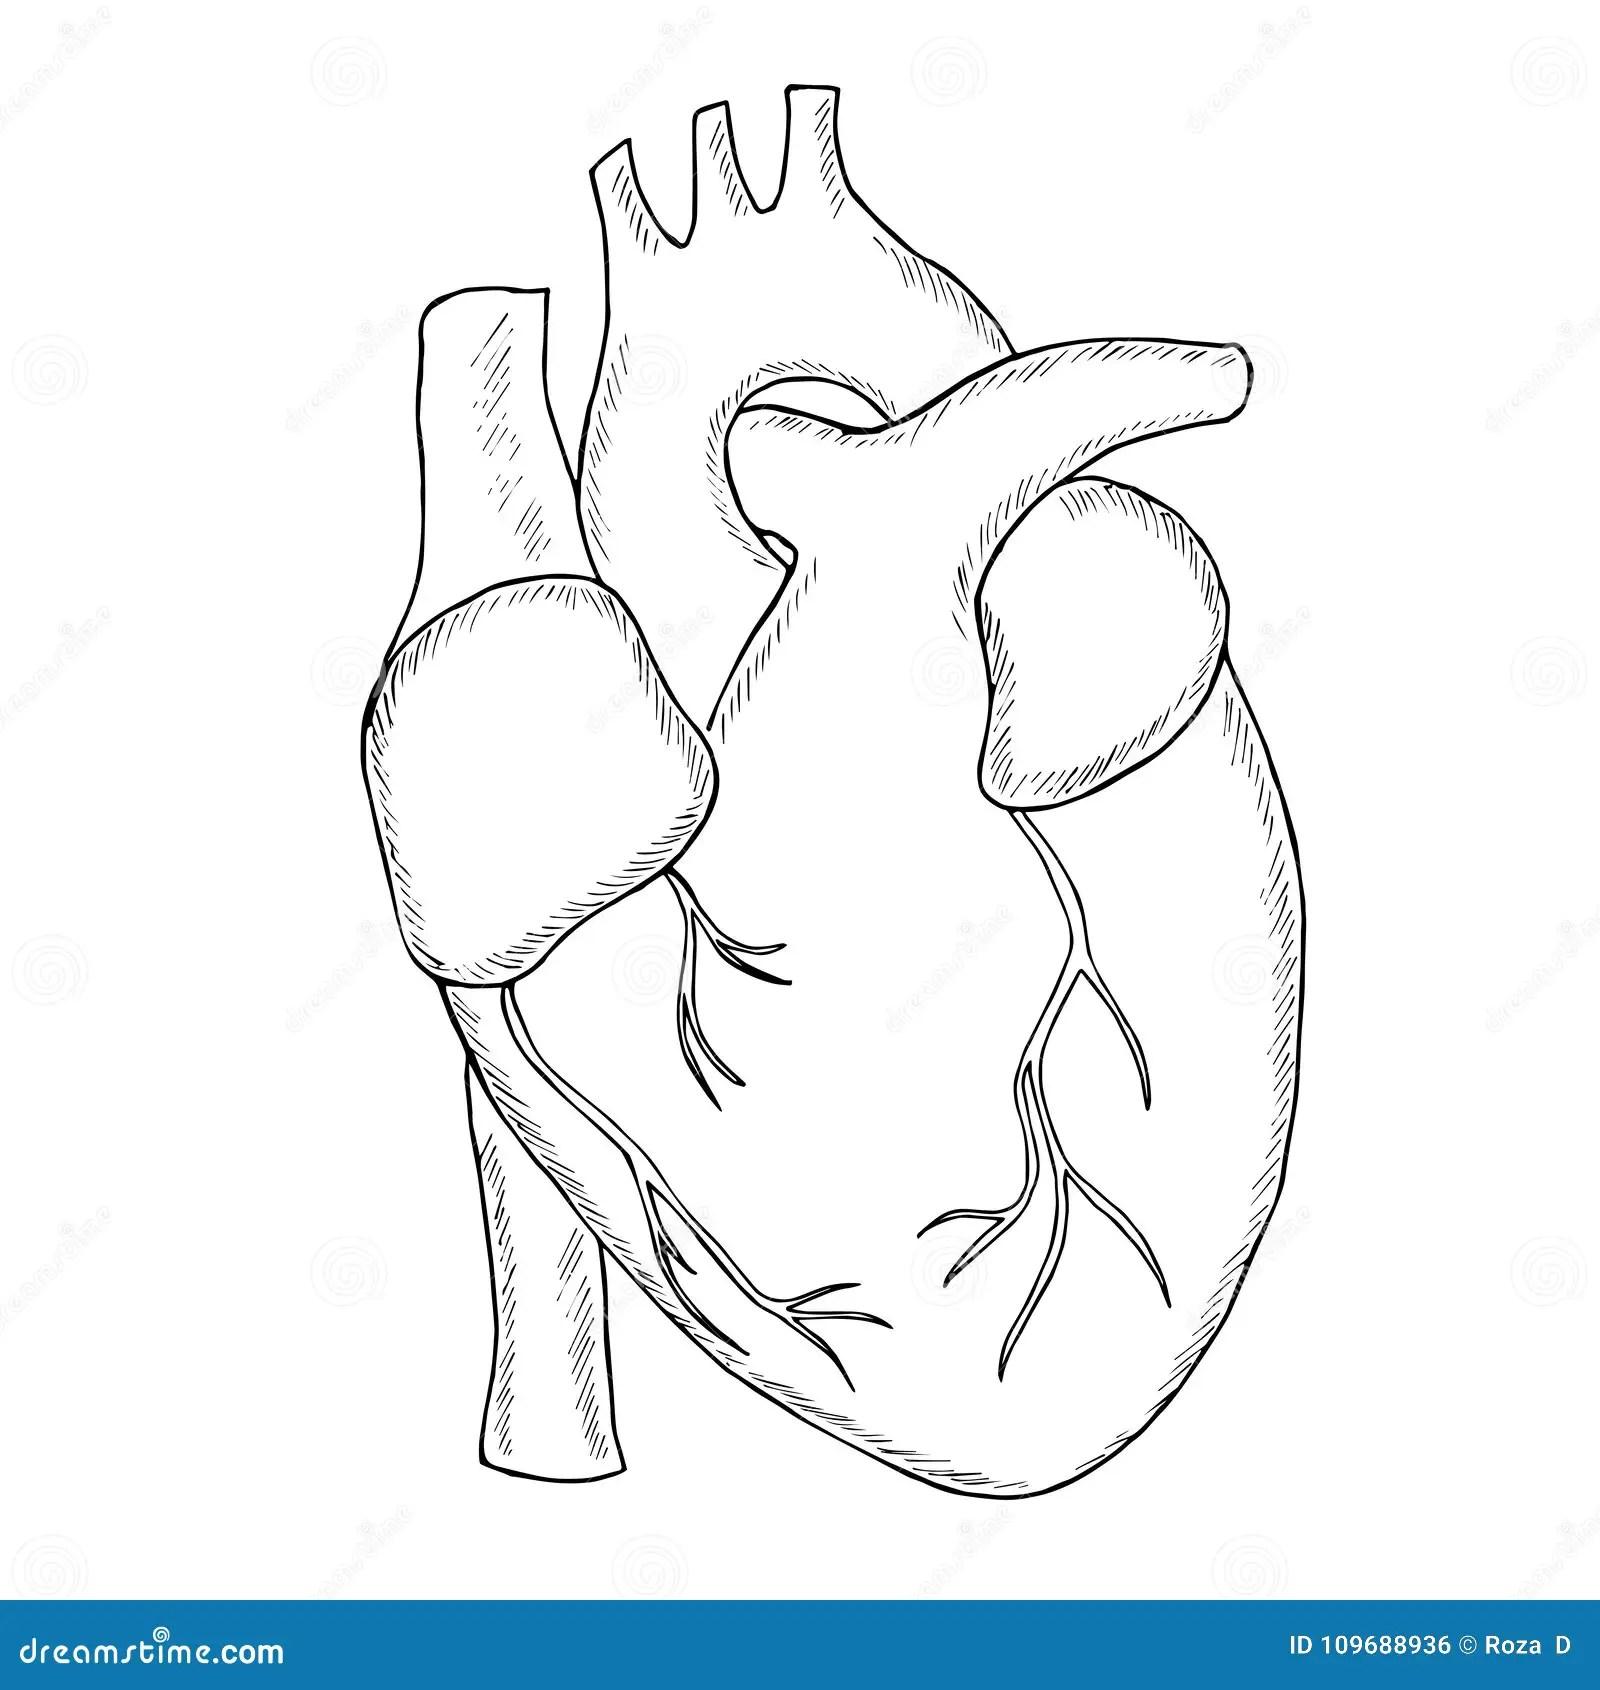 Human Heart Sketch Liner Stock Vector Illustration Of